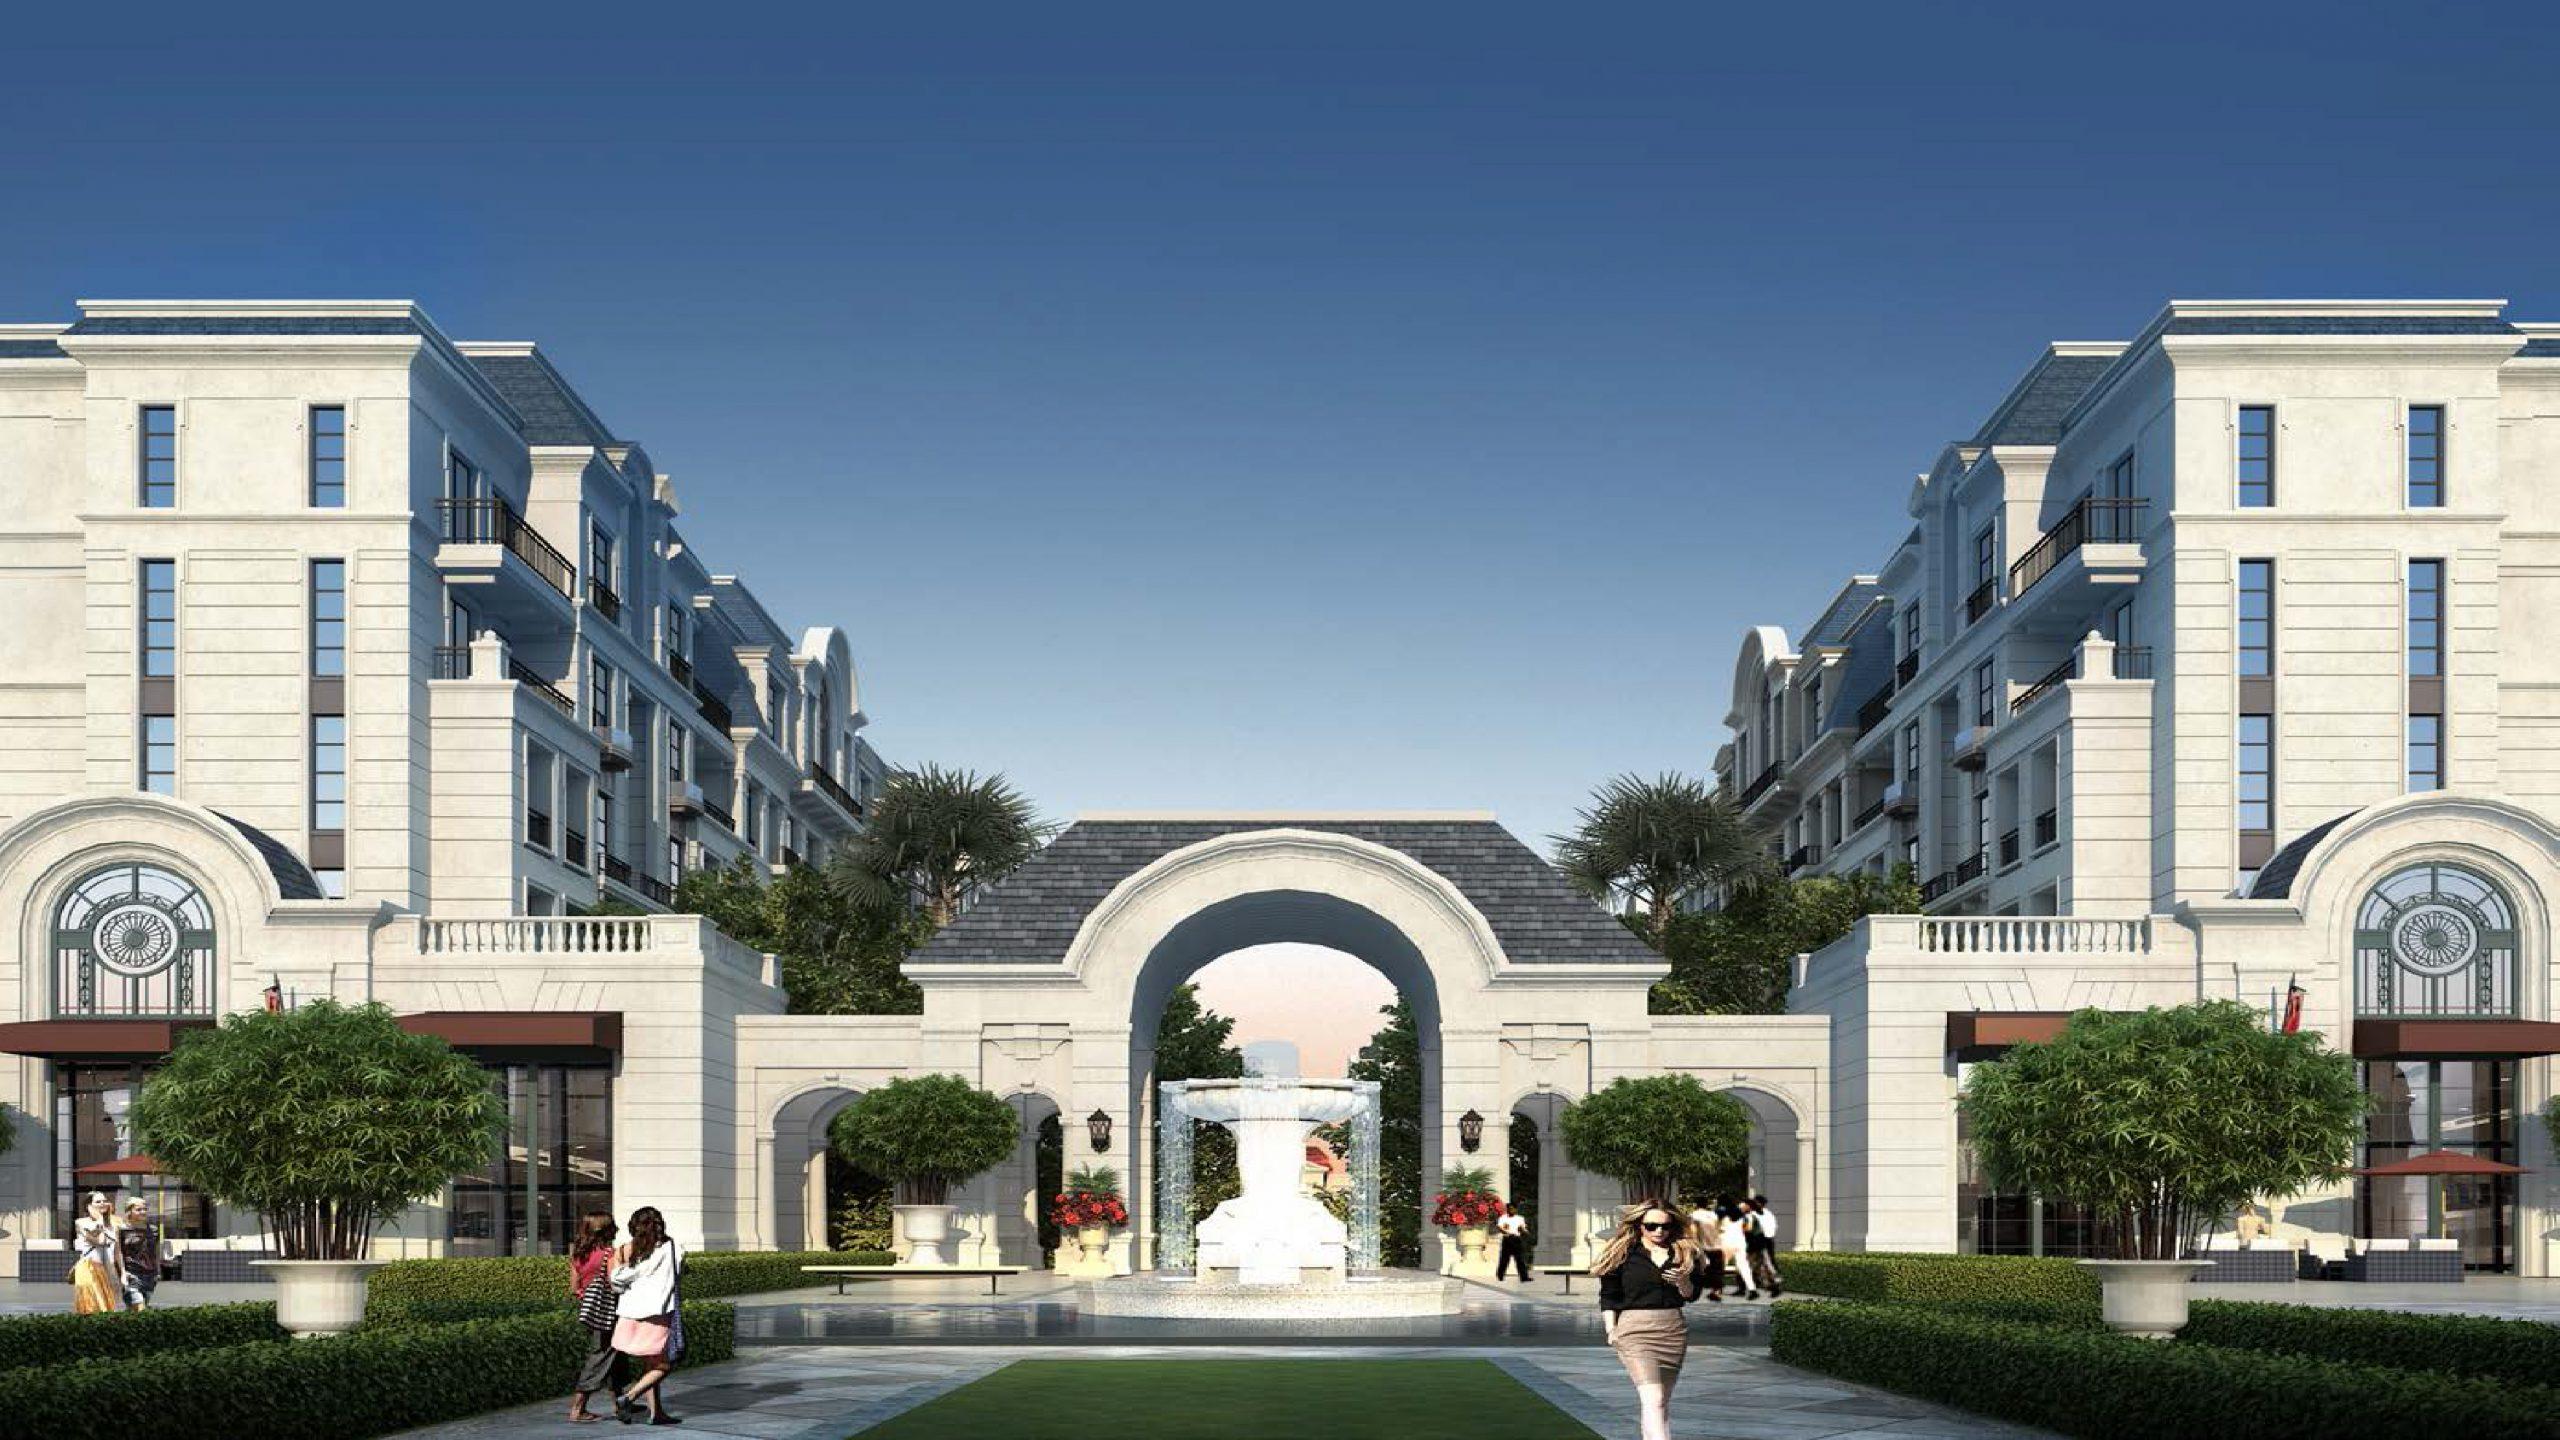 thiết kế parc villa zone 6